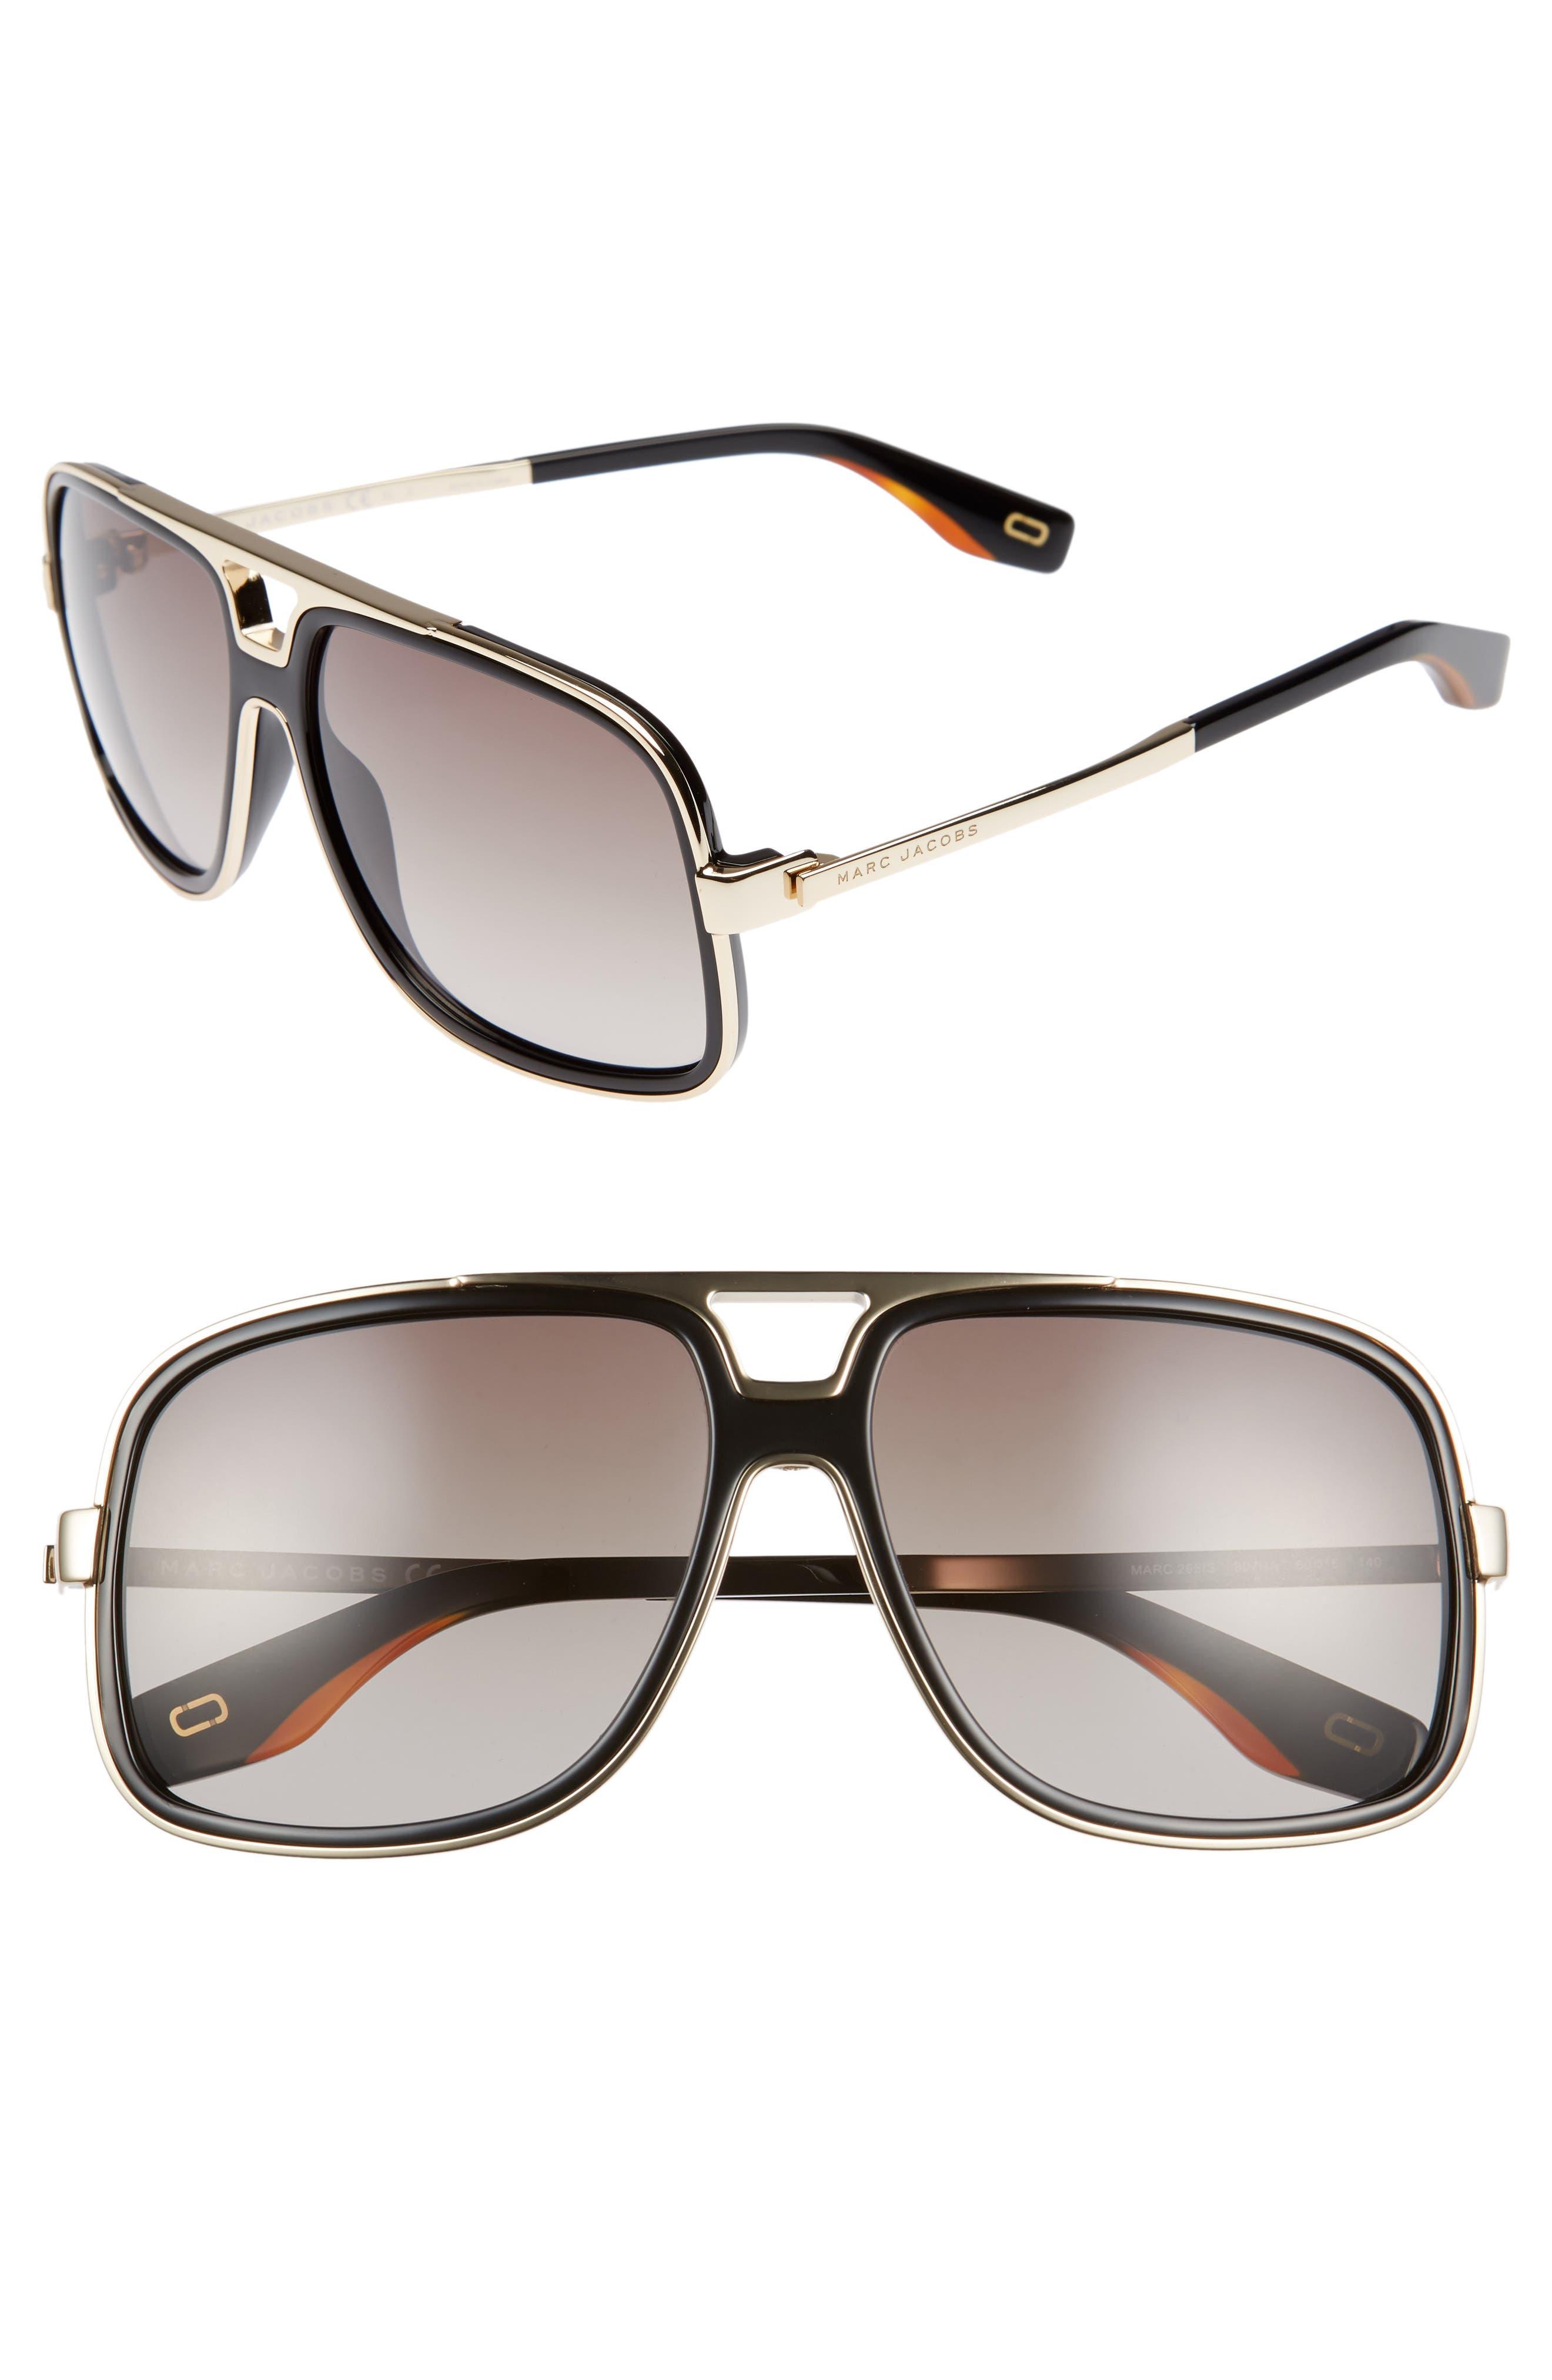 60mm Gradient Lens Aviator Sunglasses,                             Main thumbnail 1, color,                             BLACK